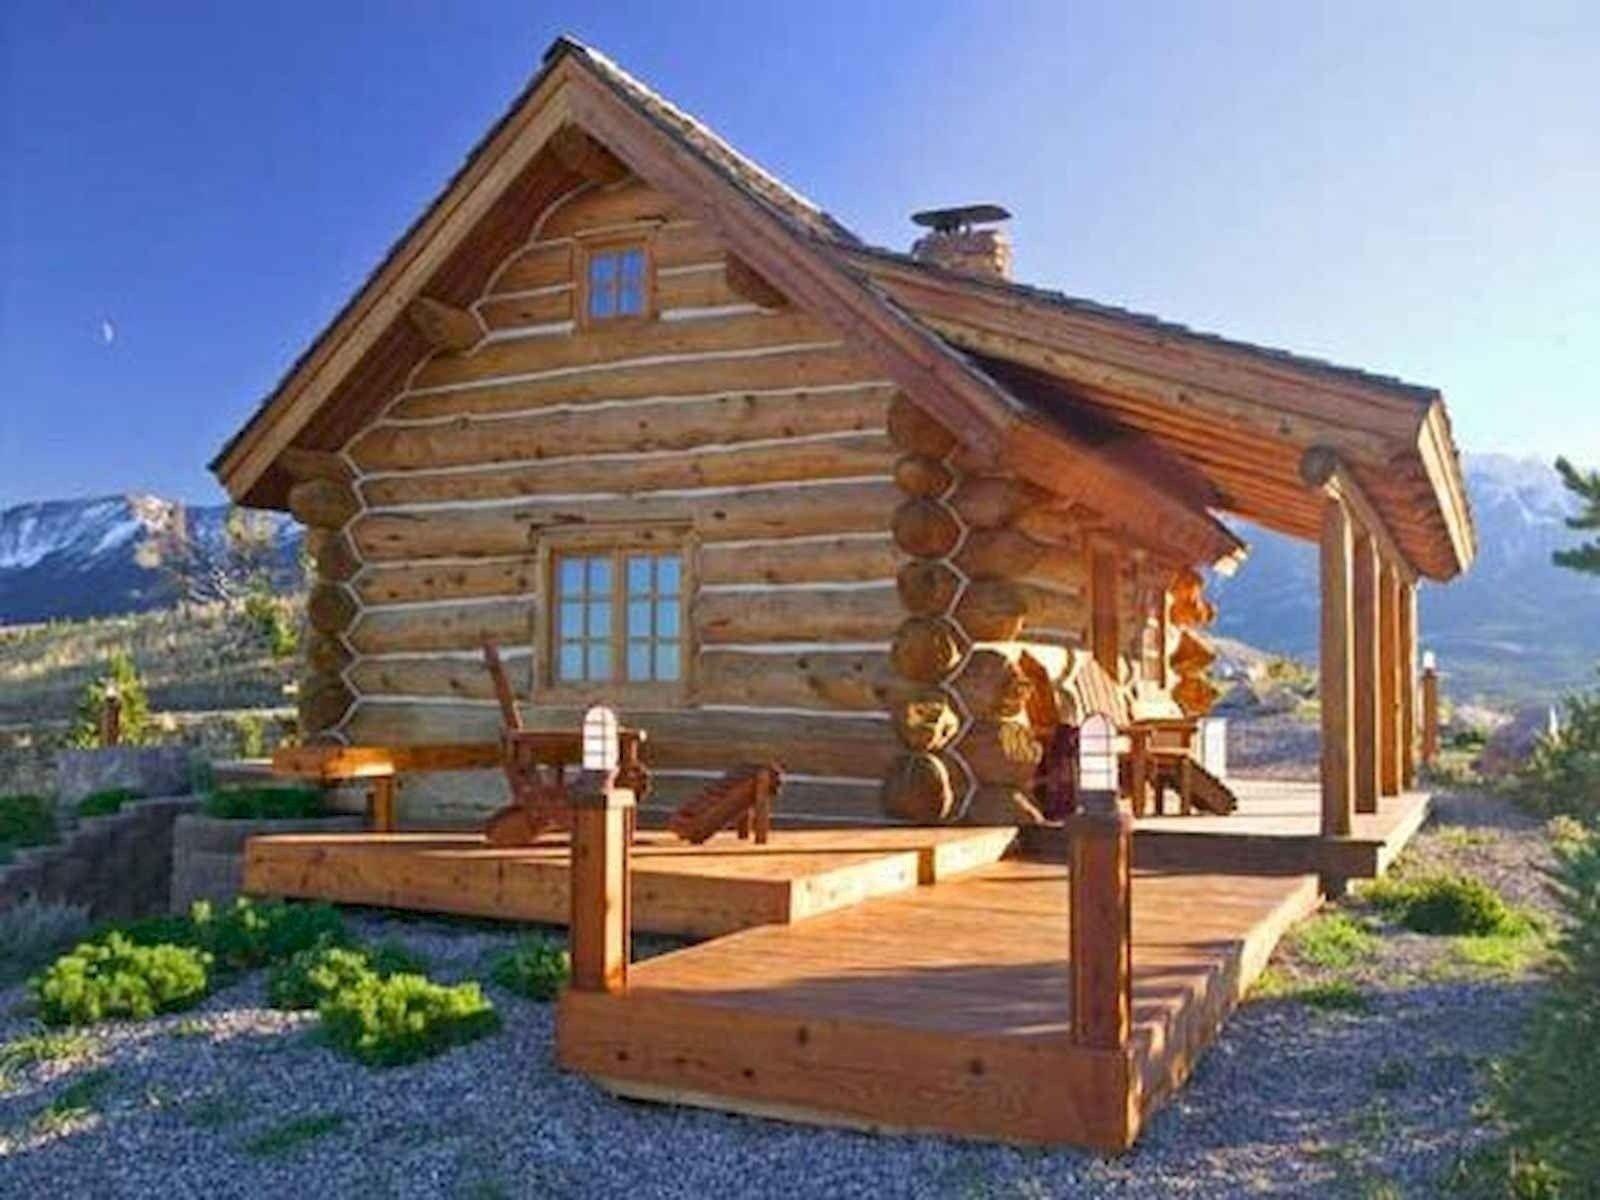 75 Best Log Cabin Homes Plans Design Ideas In 2020 Small Log Cabin Log Cabin Floor Plans Log Cabin Designs